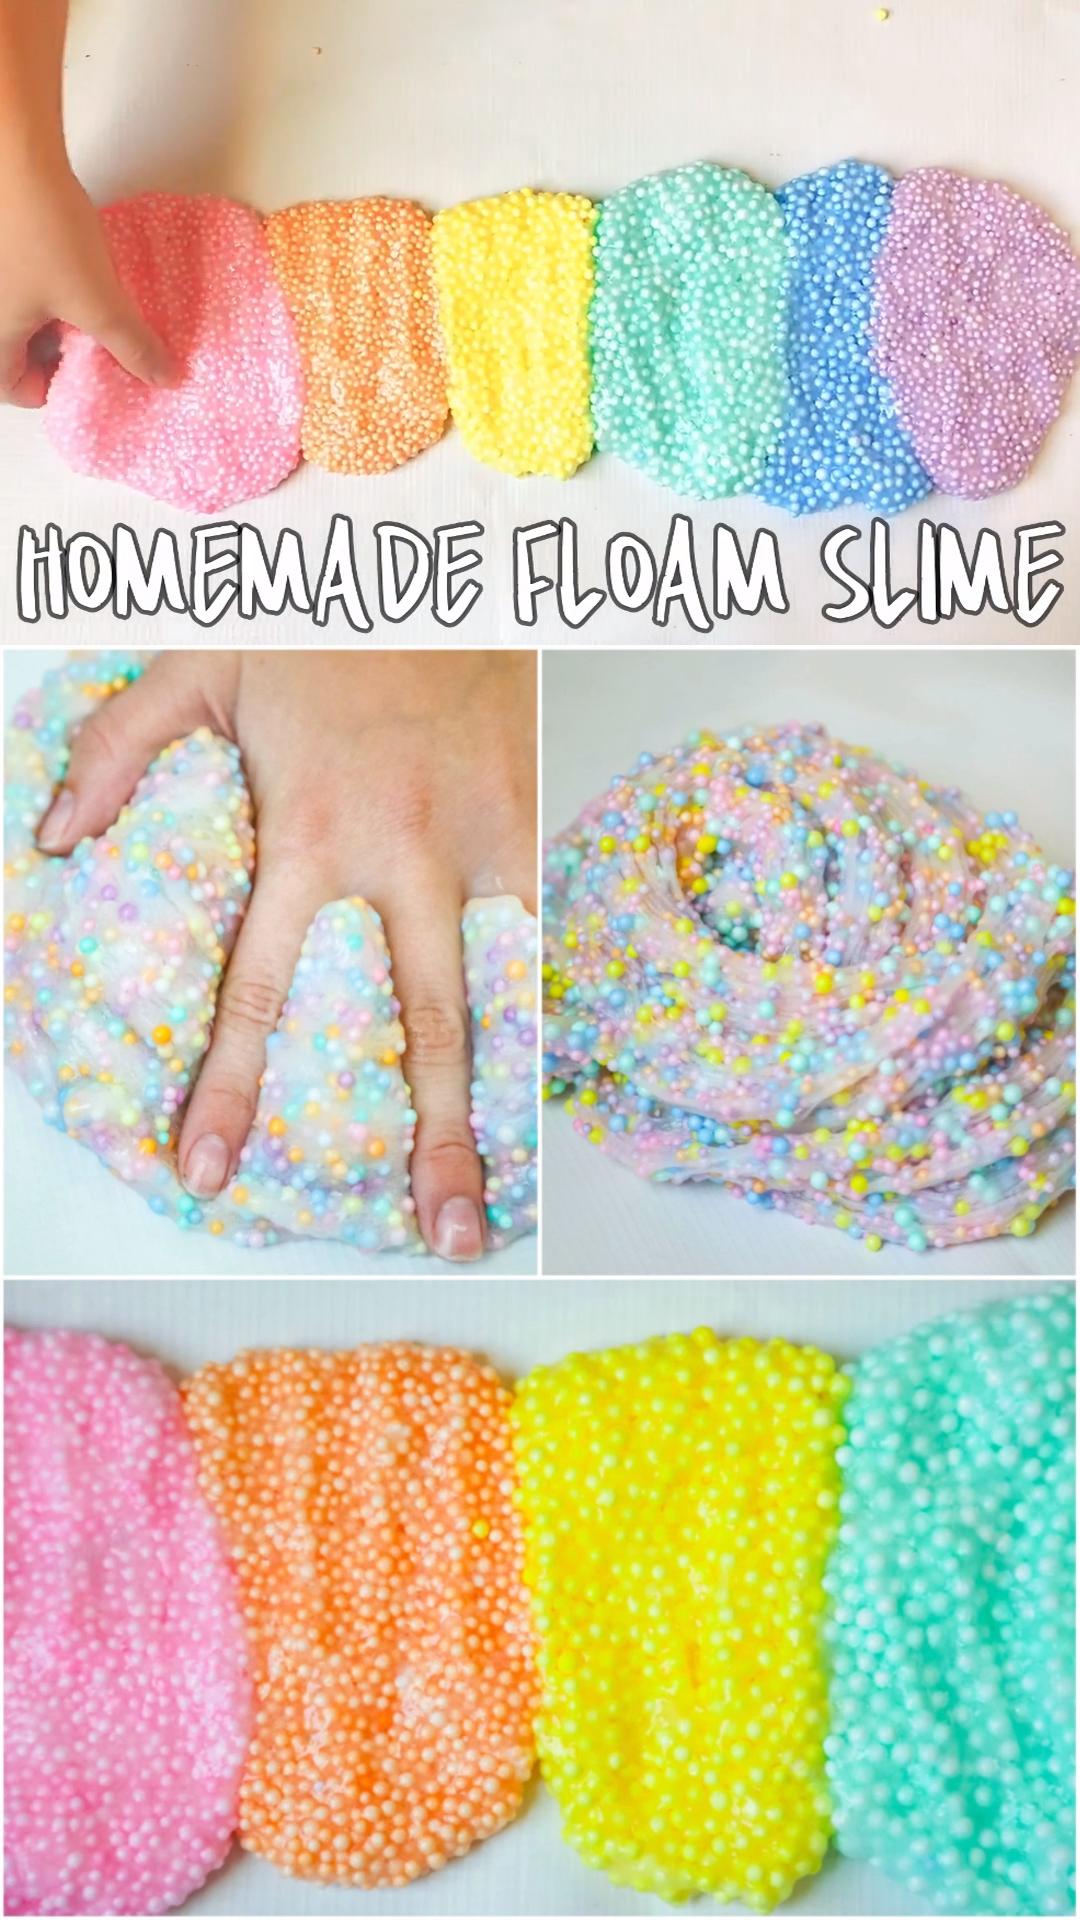 Make crunchy floam slime with the kids. Floam recipe diy at home. Sensory kids activity to make. Slime recipe.